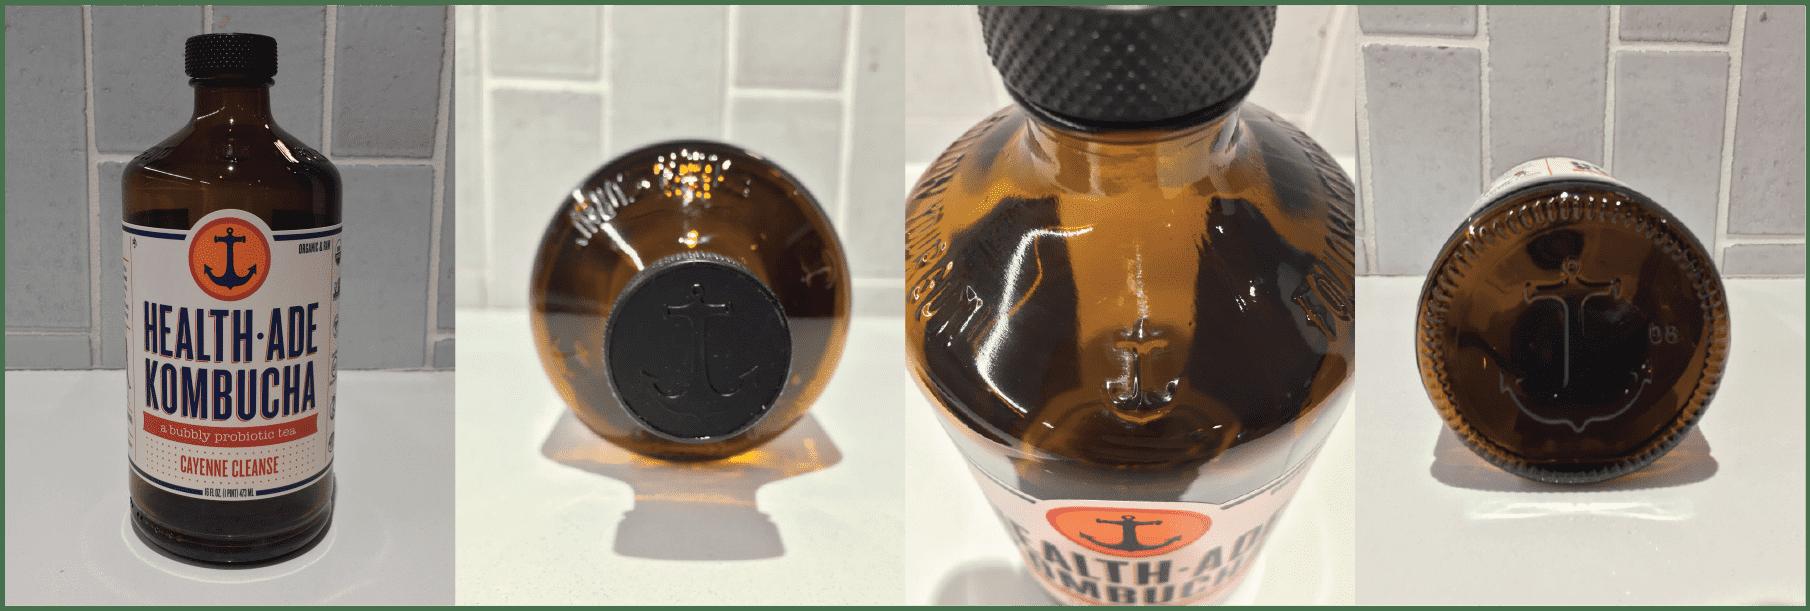 Health-Ade Kombucha Bottle Design Merchandising